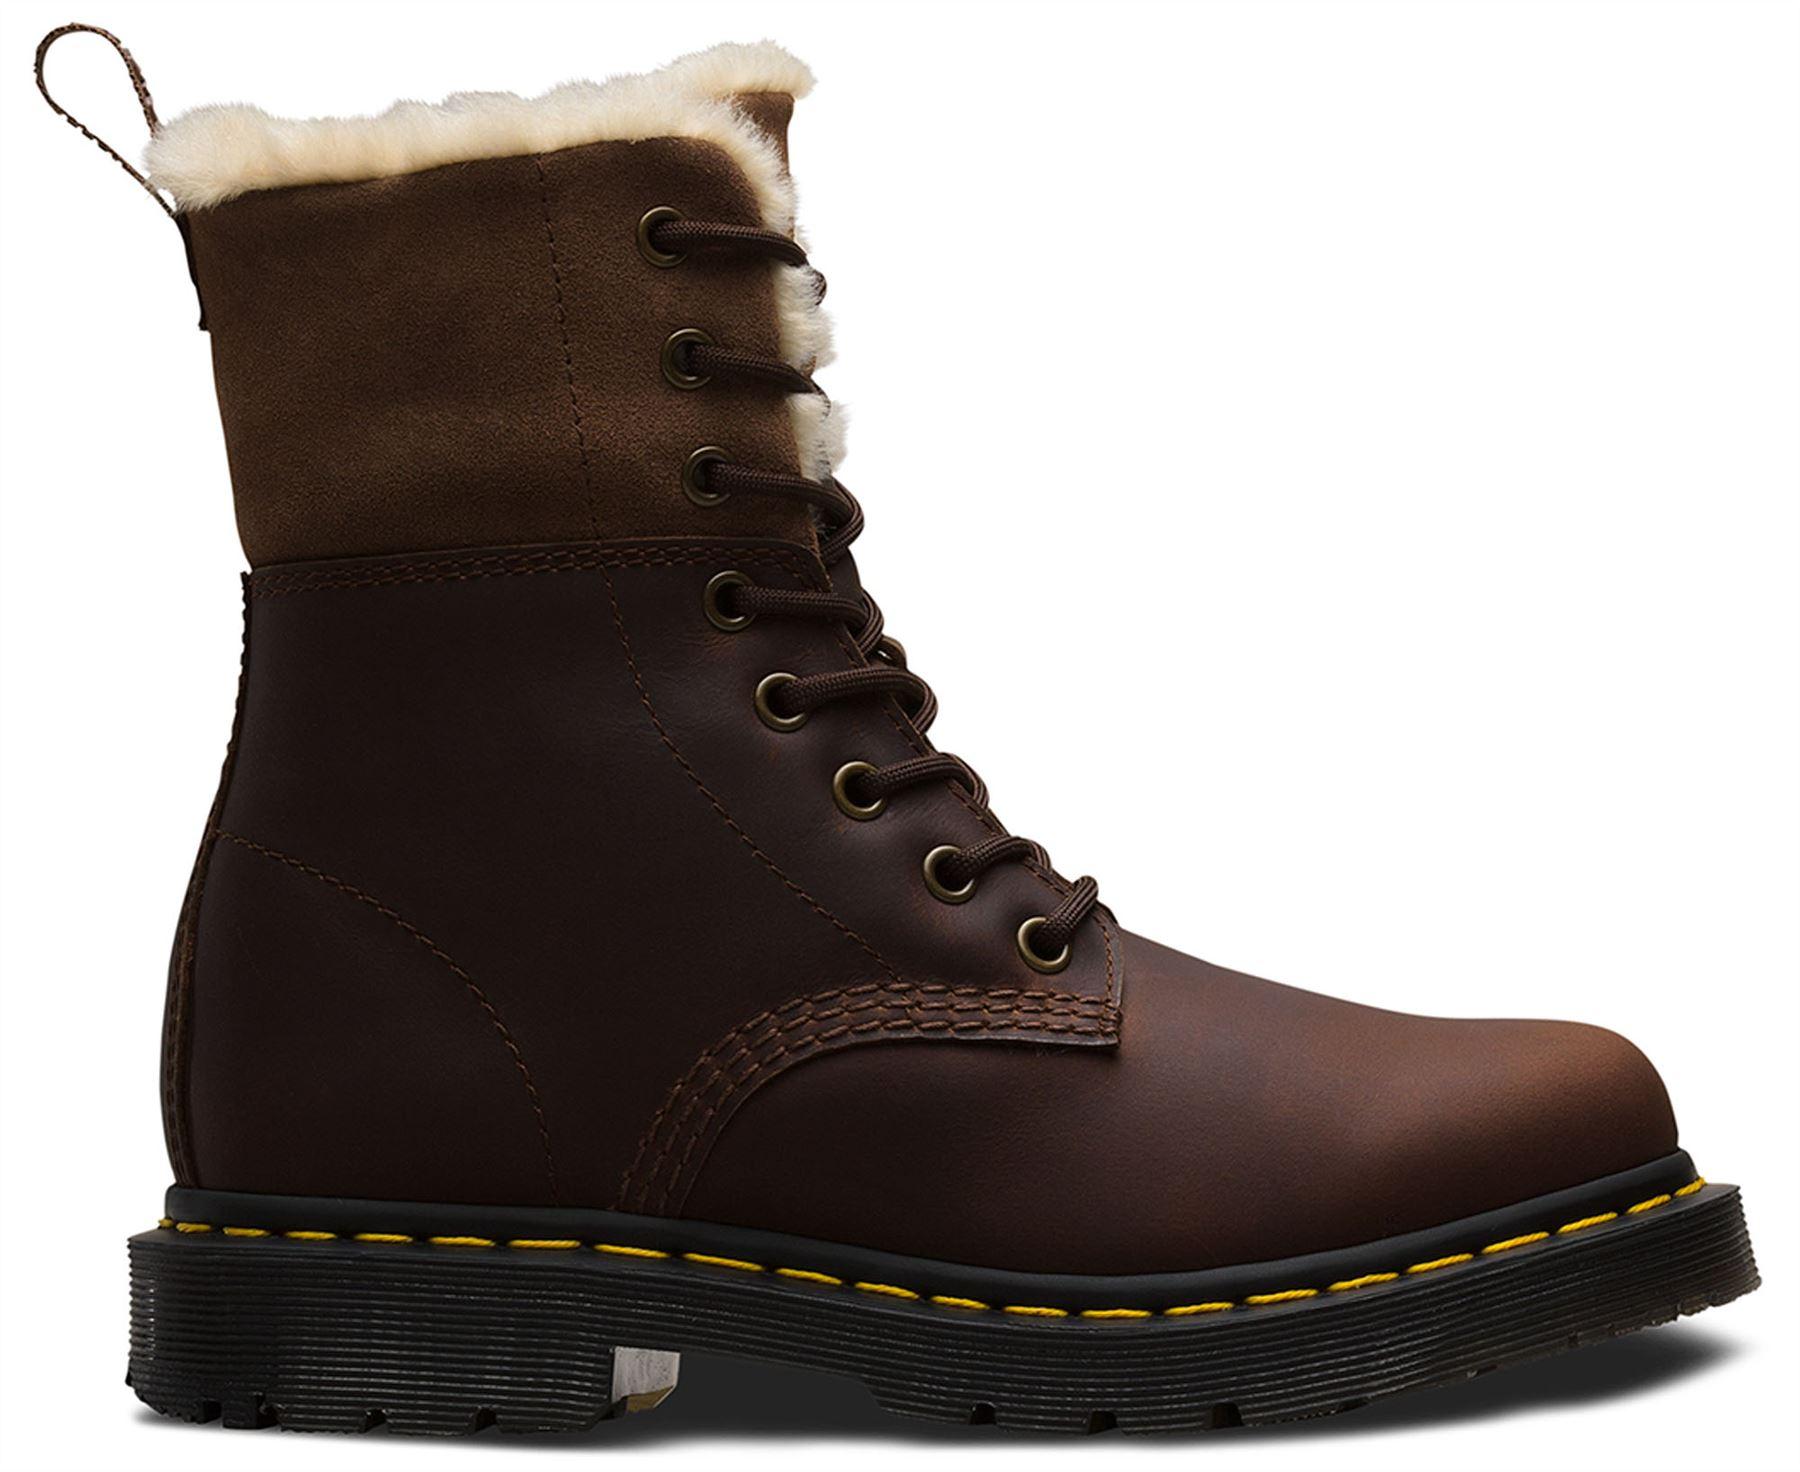 Dr Martens 1460 Kolbert Dark braun Water Resistant Snowplow Waxy Waxy Waxy Leather Stiefel 46890a